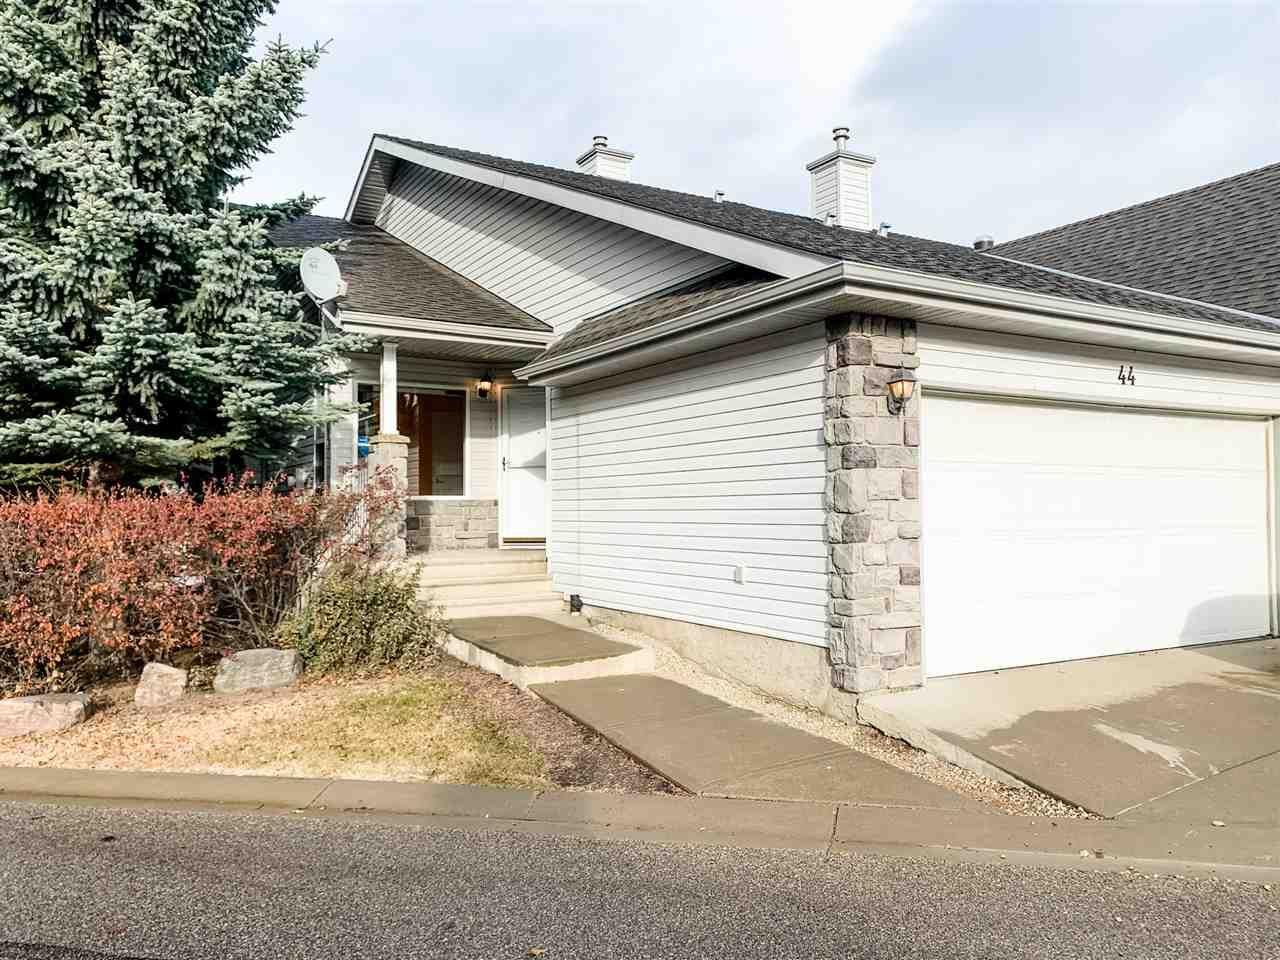 Main Photo: 44 330 Galbraith Close in Edmonton: Zone 58 House Half Duplex for sale : MLS®# E4226186